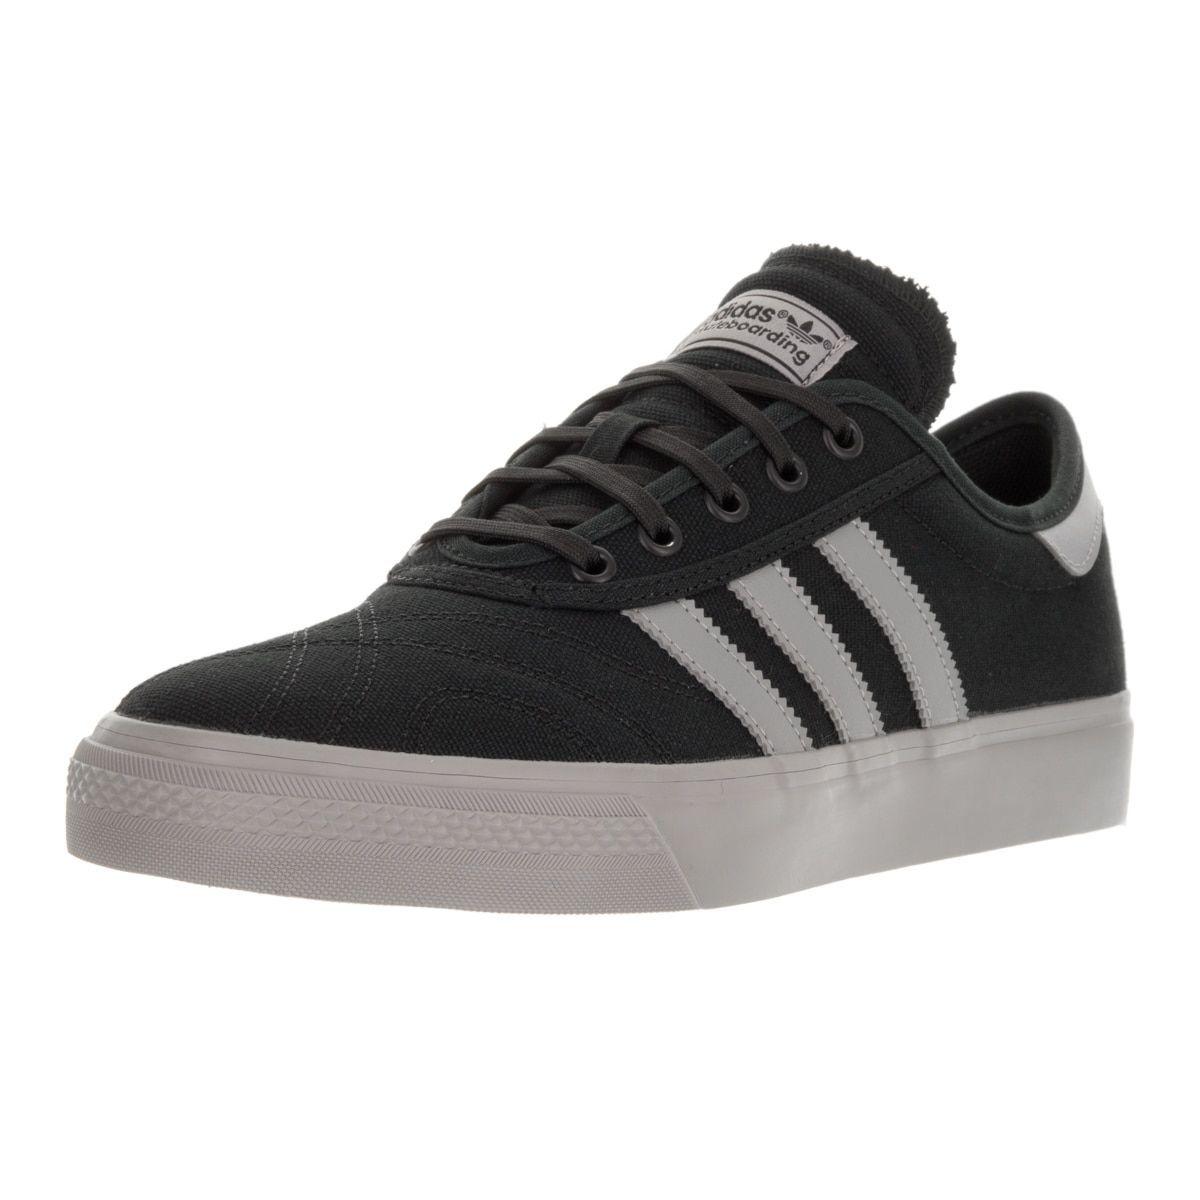 Adidas Men s Adi-Ease Premiere Cblack Chsogr Cblack Skate Shoe by Adidas fd8a570cf